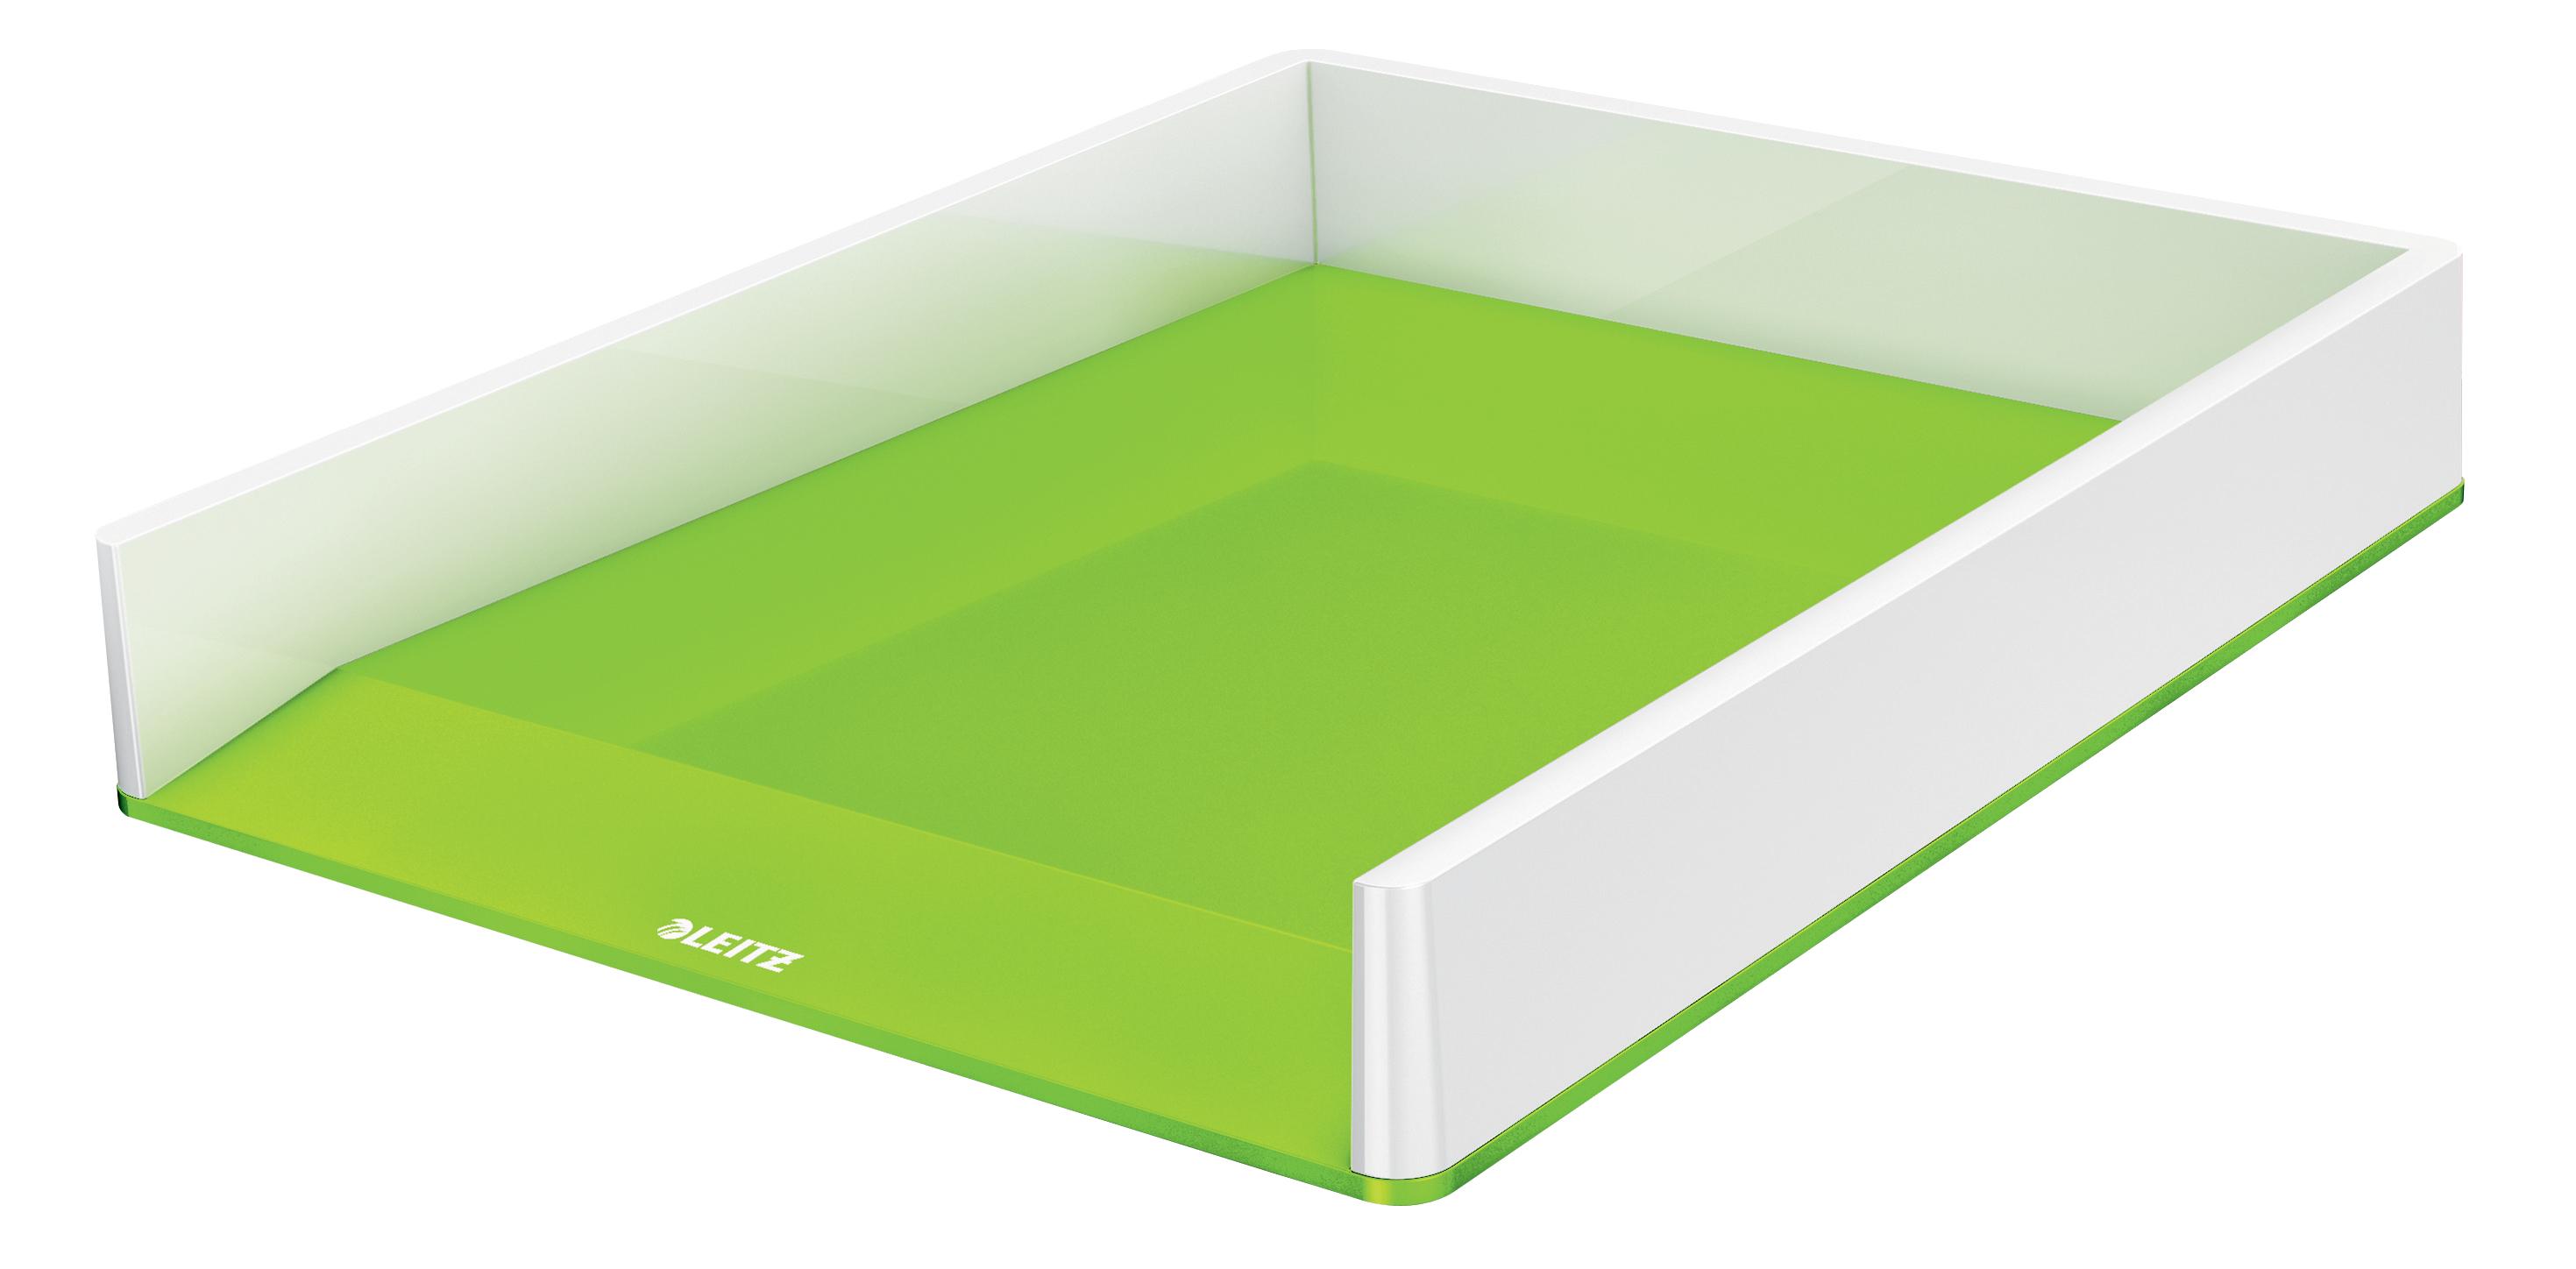 Letter Trays Leitz WOW Letter Tray Dual Colour White/Green